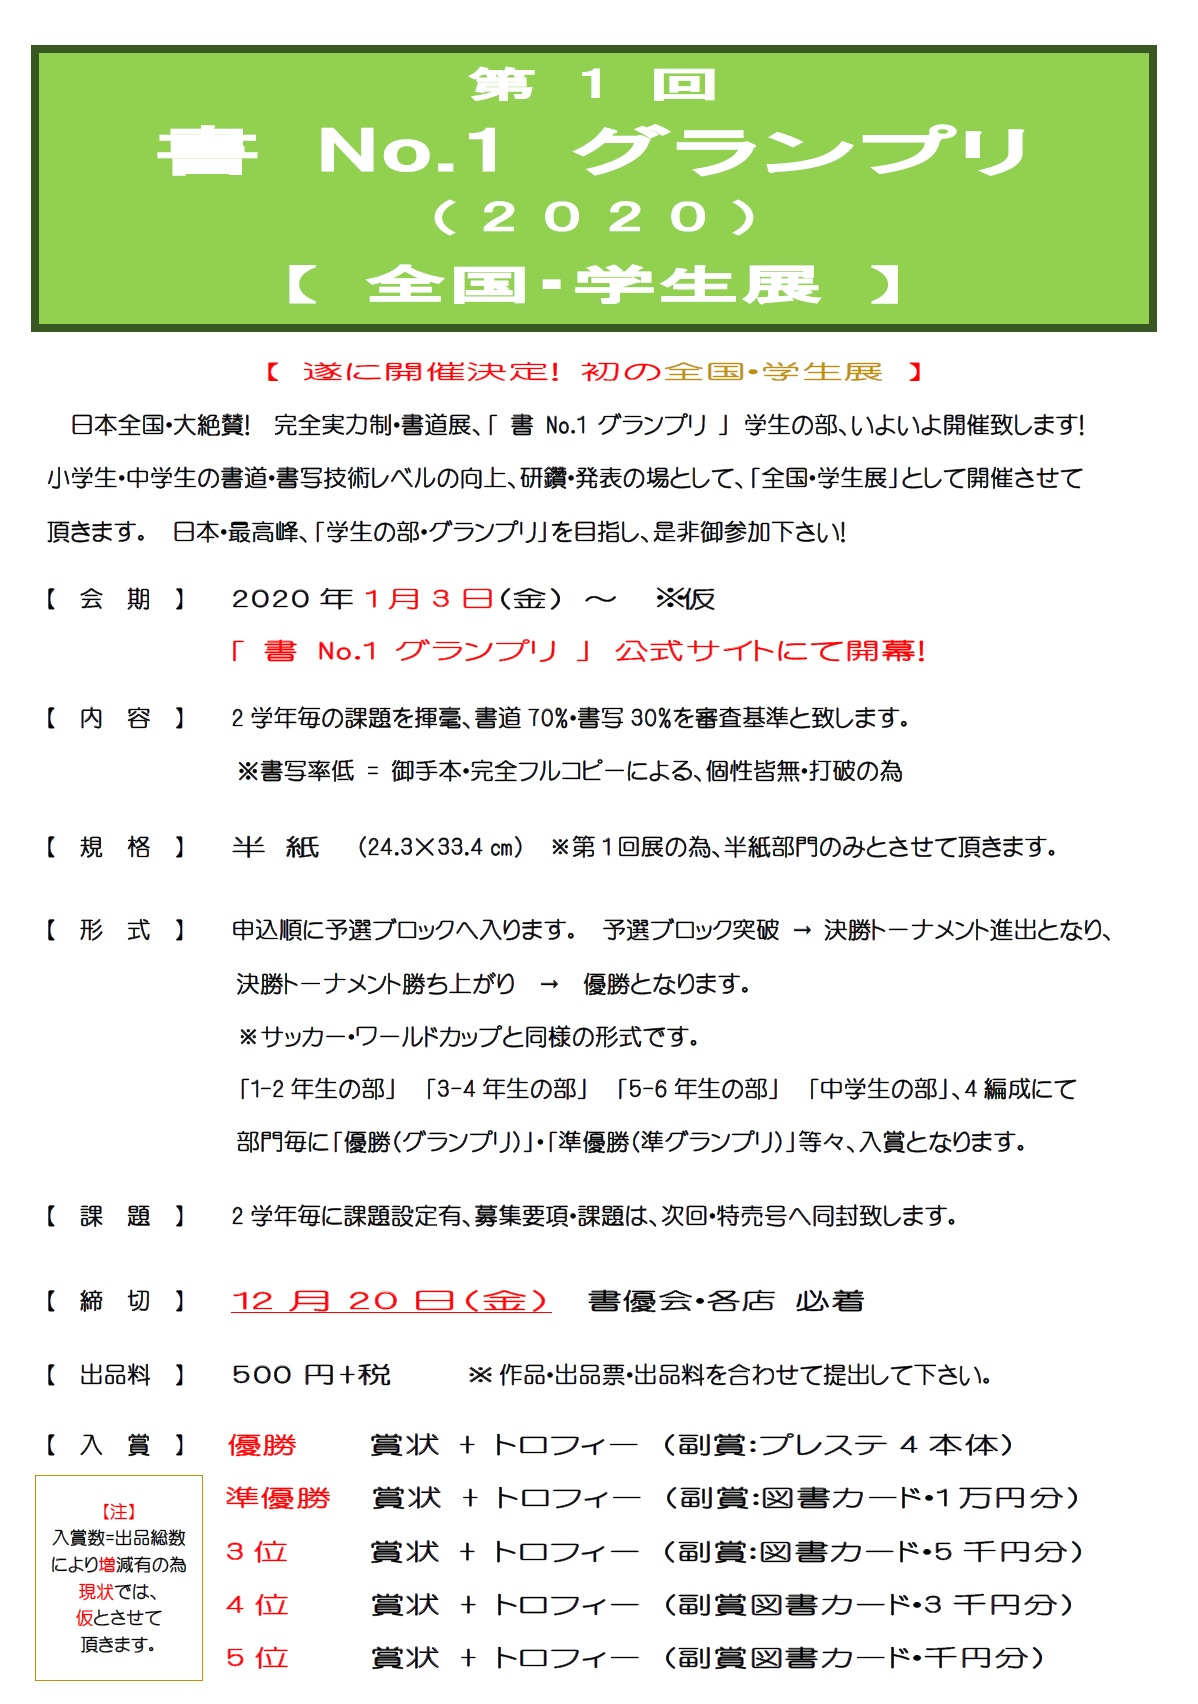 s-n-1-gp-gakuseibu-2020-poster-2019-07-04.jpg